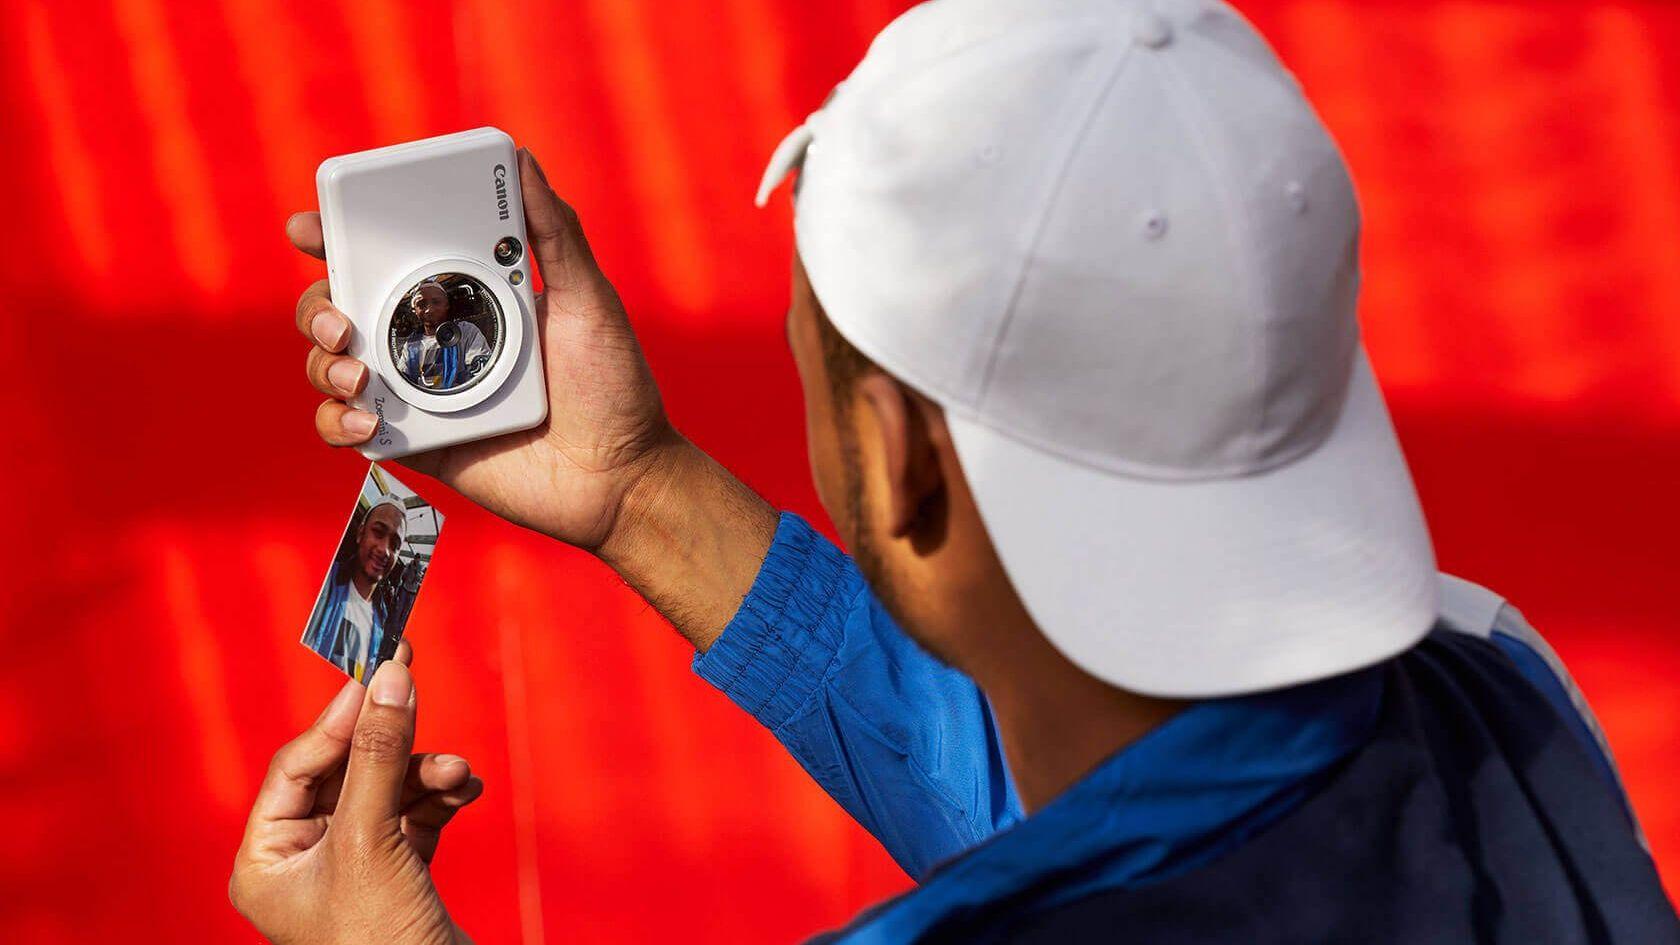 b49069c75 Digital Cameras, Lenses, Camcorders & Printers - Canon Ireland